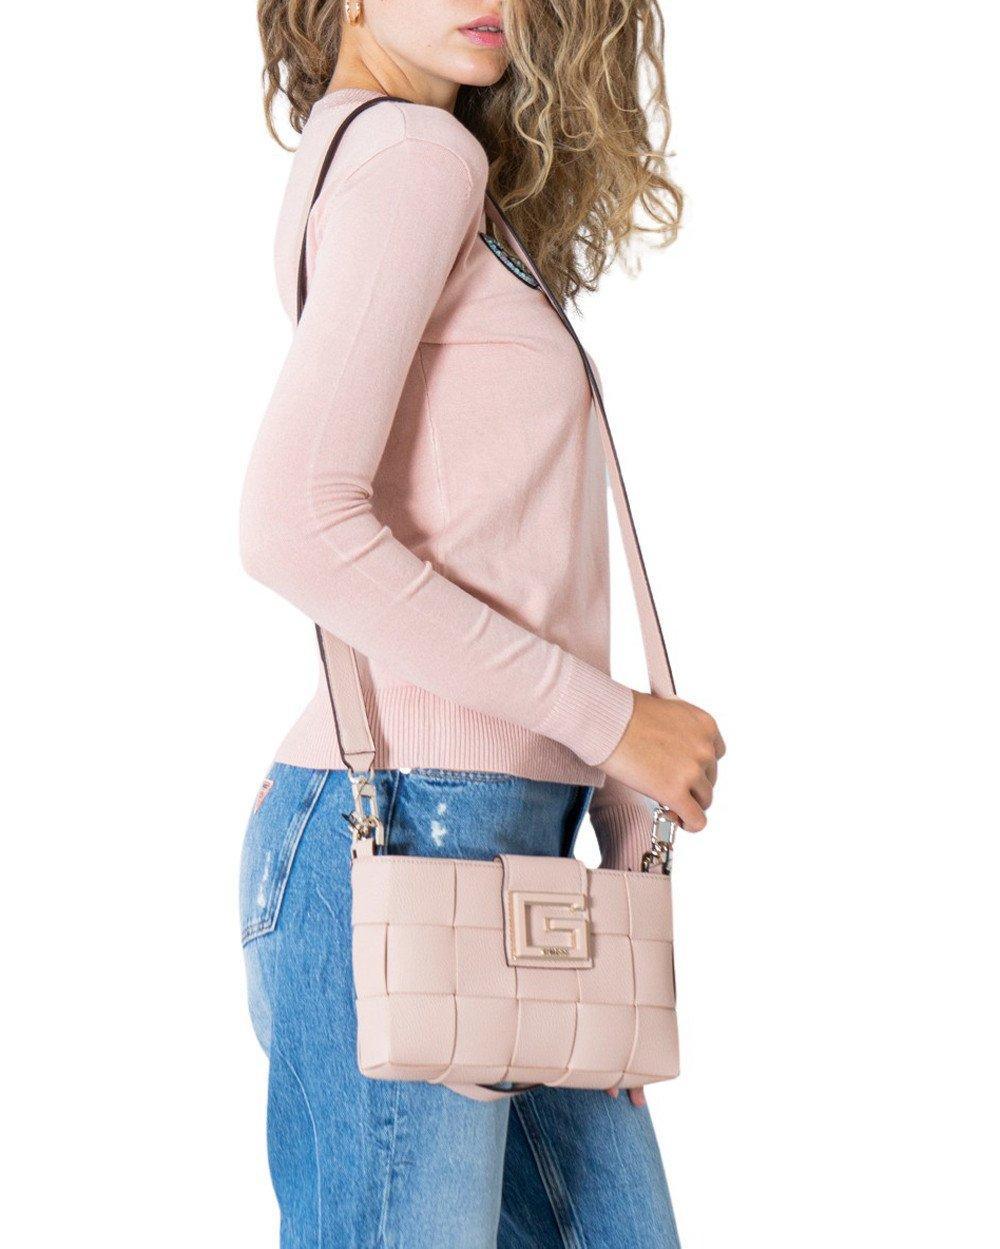 Guess Women's Crossbody Bag Various Colours 305761 - pink UNICA